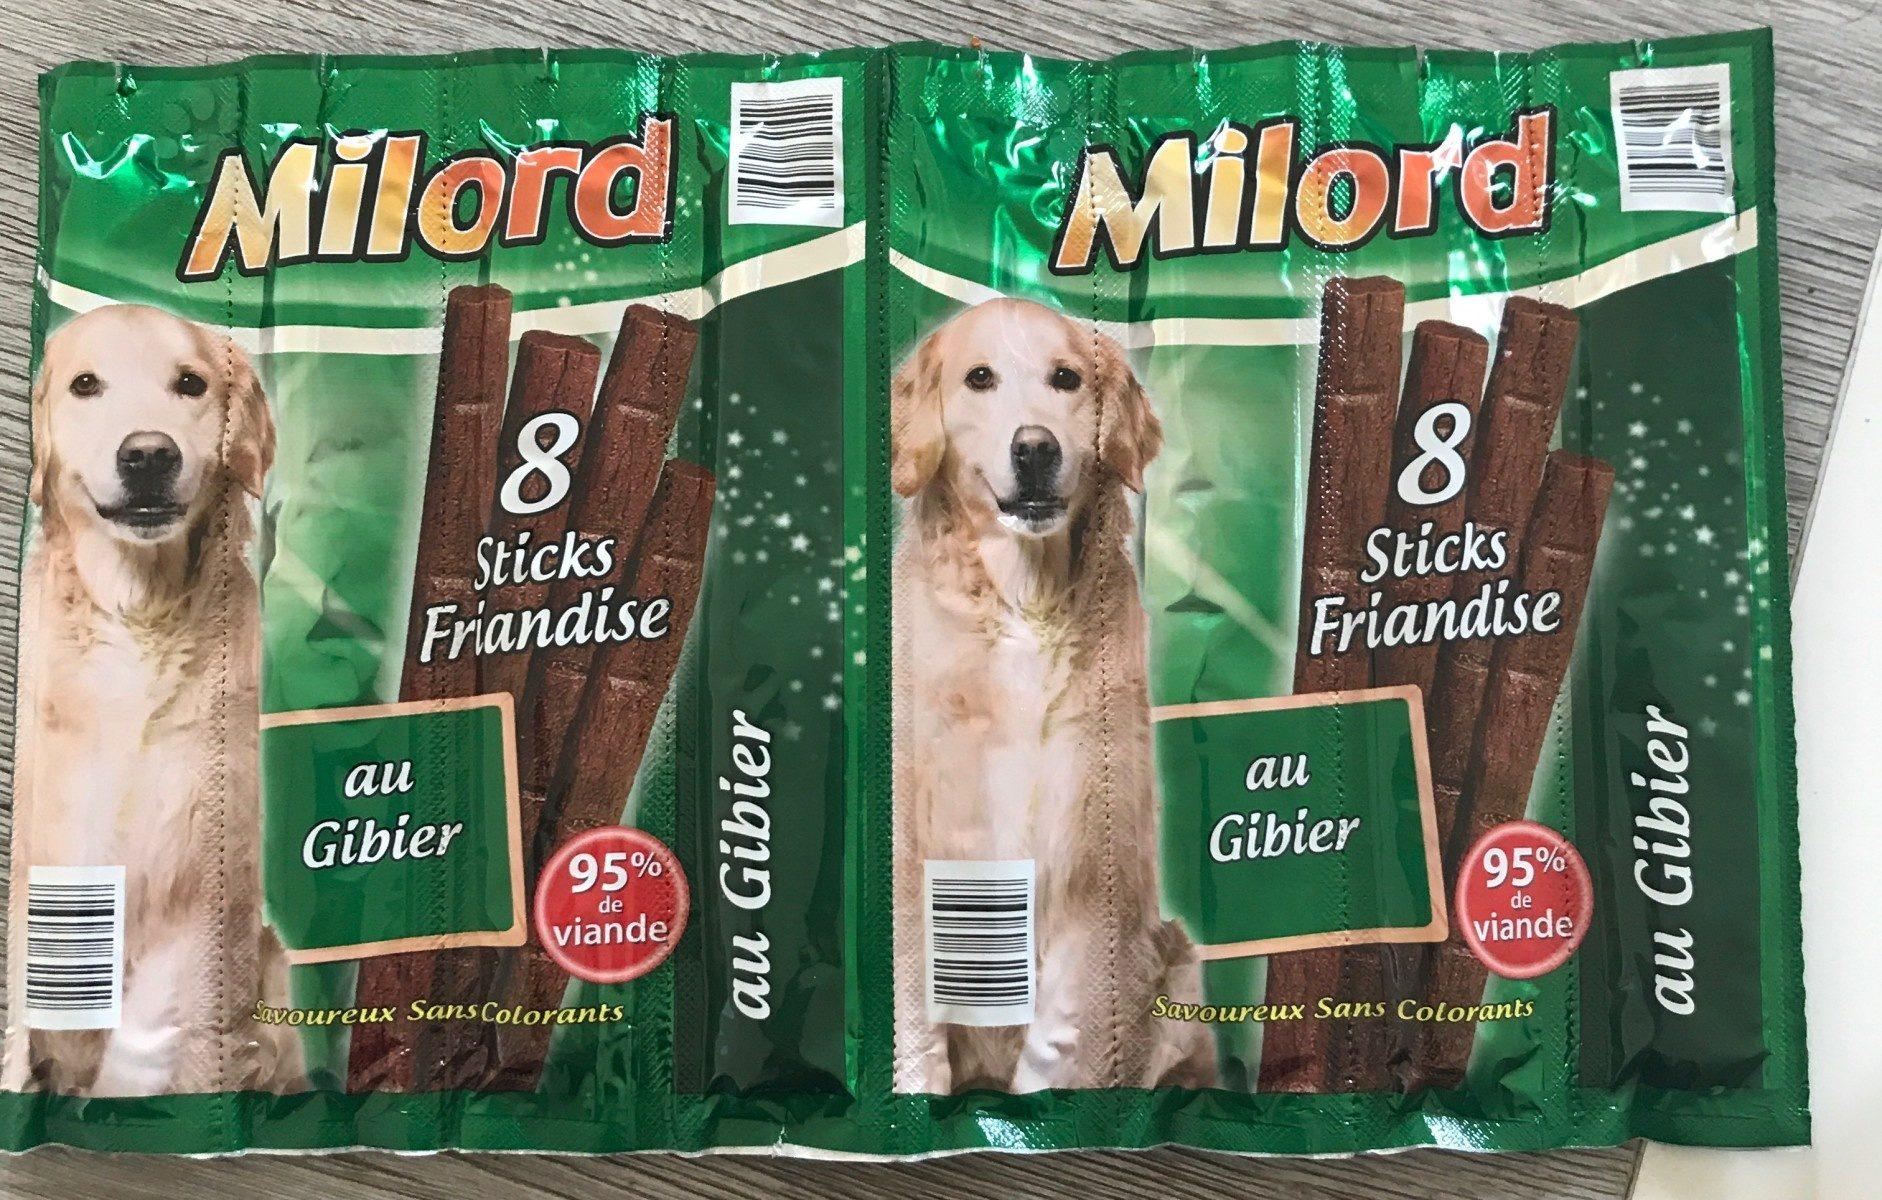 Sticks friandise au gibier - Product